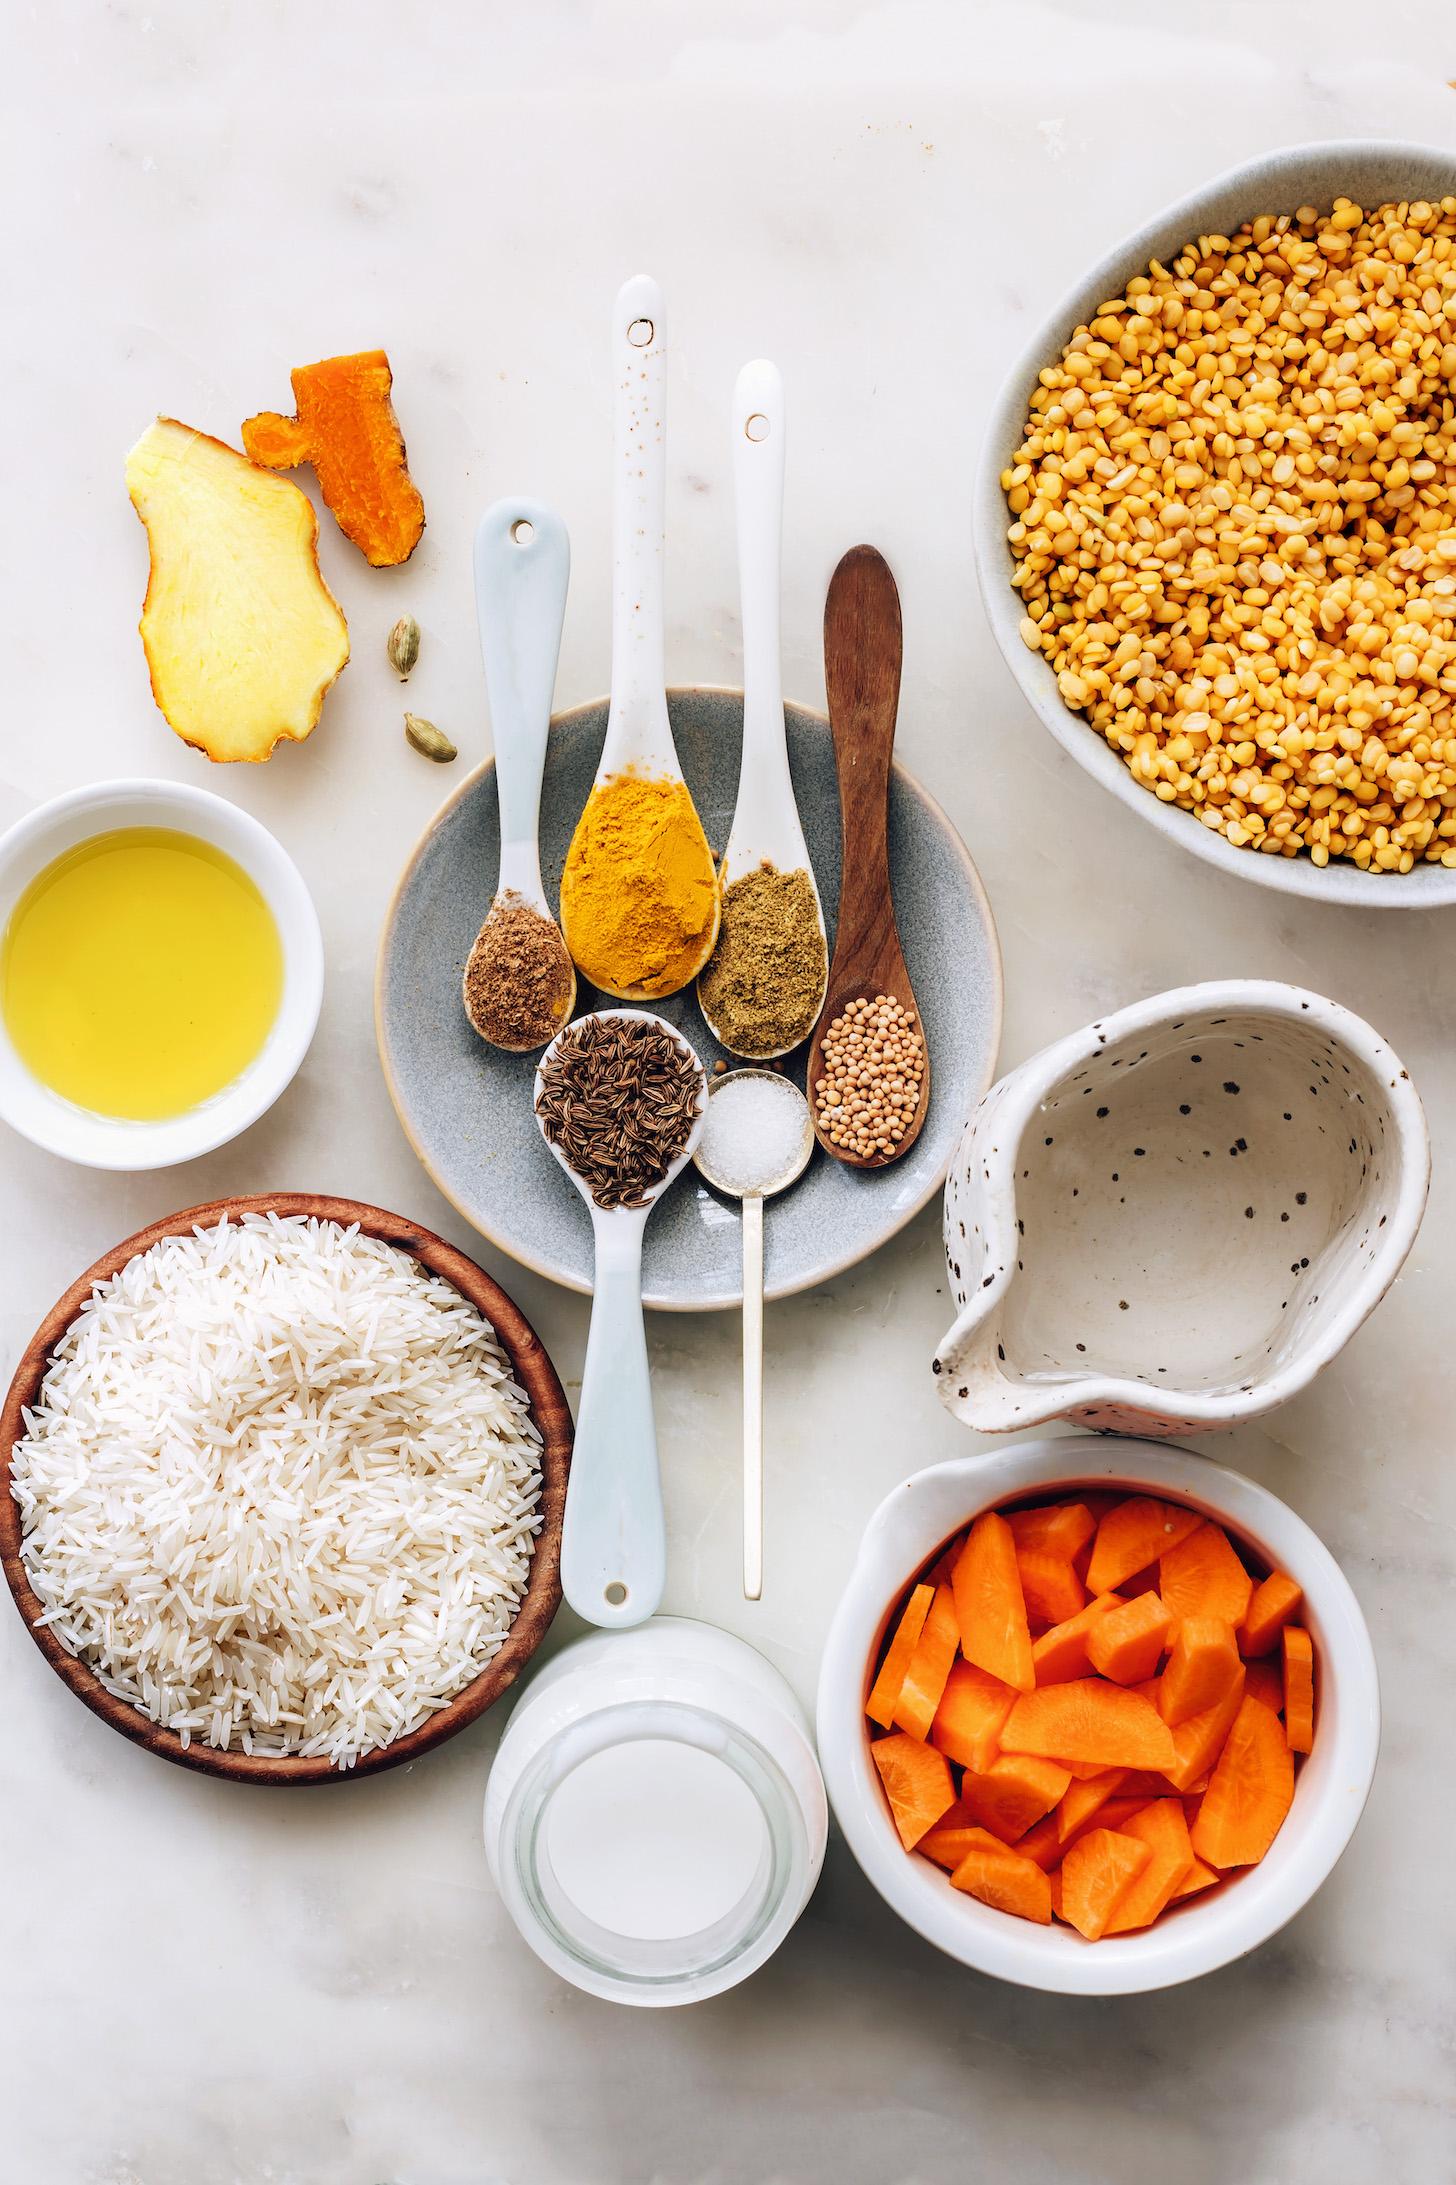 Especias, aceite de aguacate, arroz, leche de coco, zanahorias, agua y moong dal amarillo partido